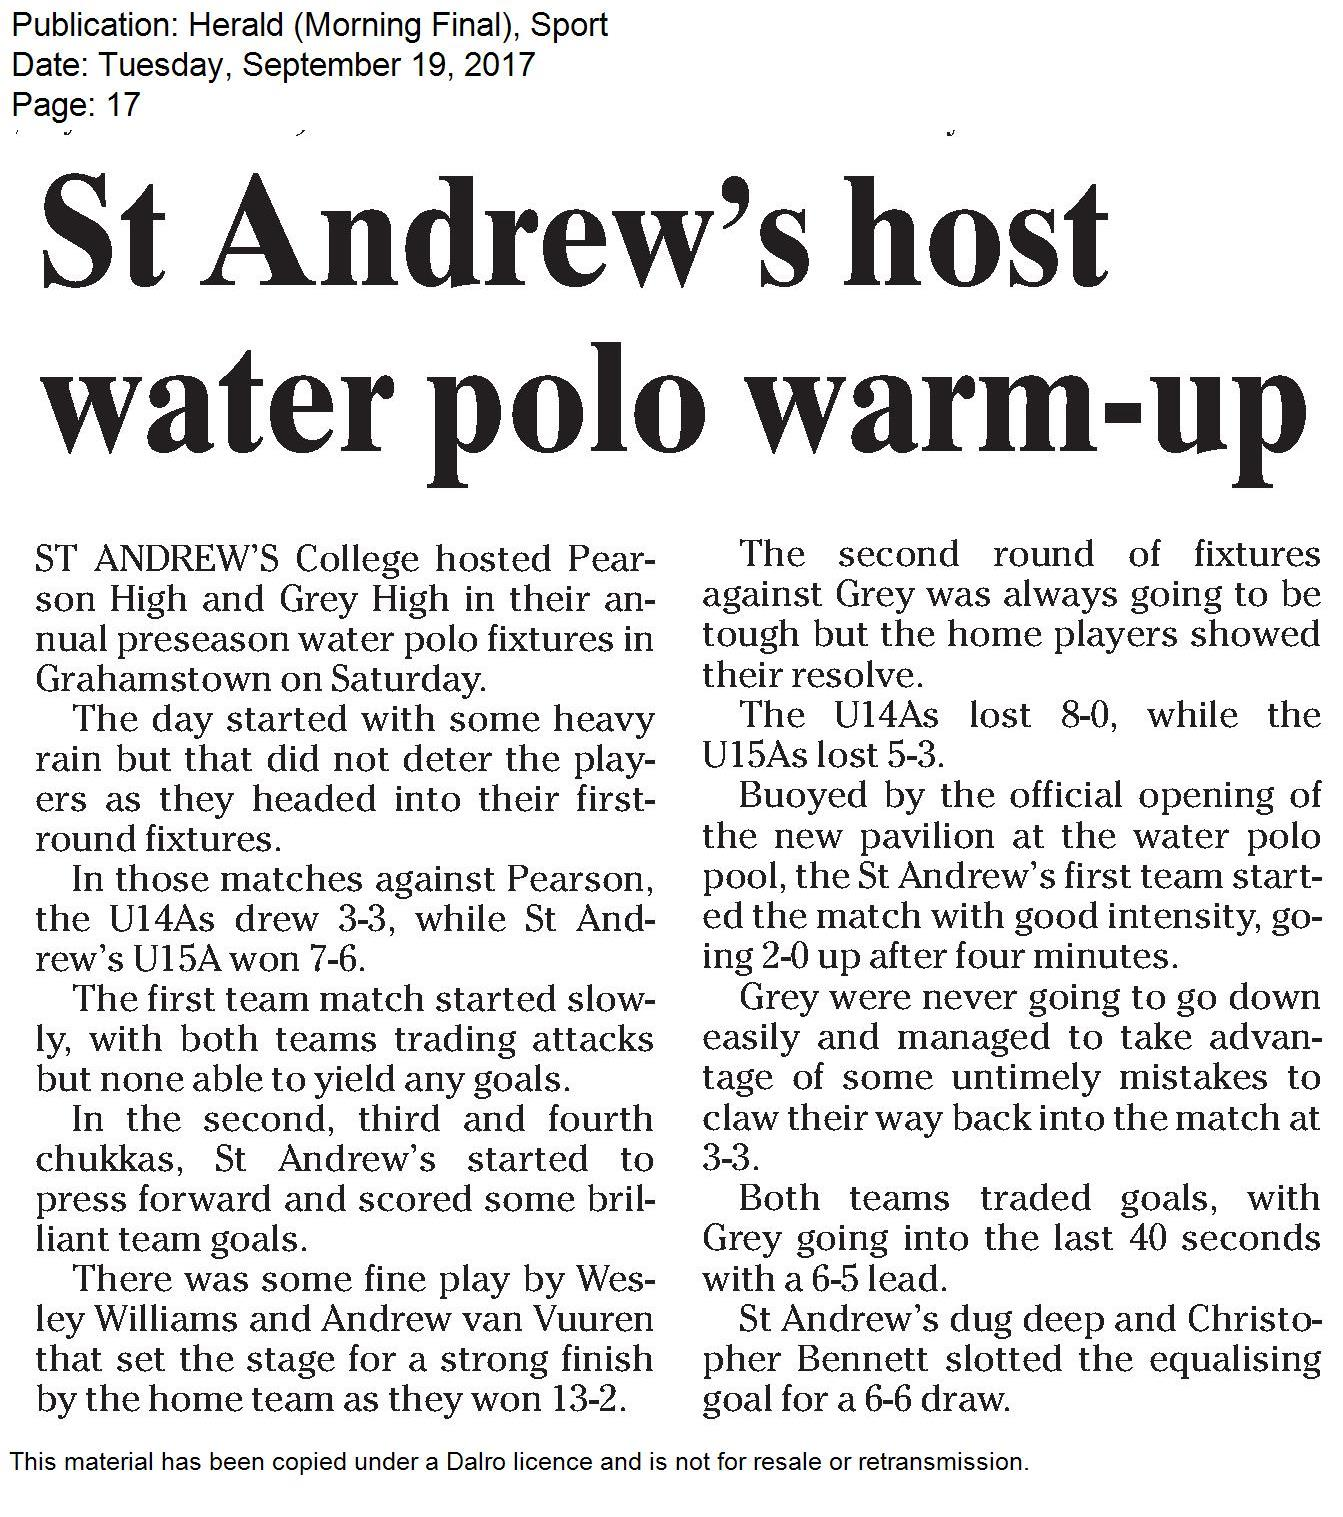 Water Polo warm up vs Grey Pearson